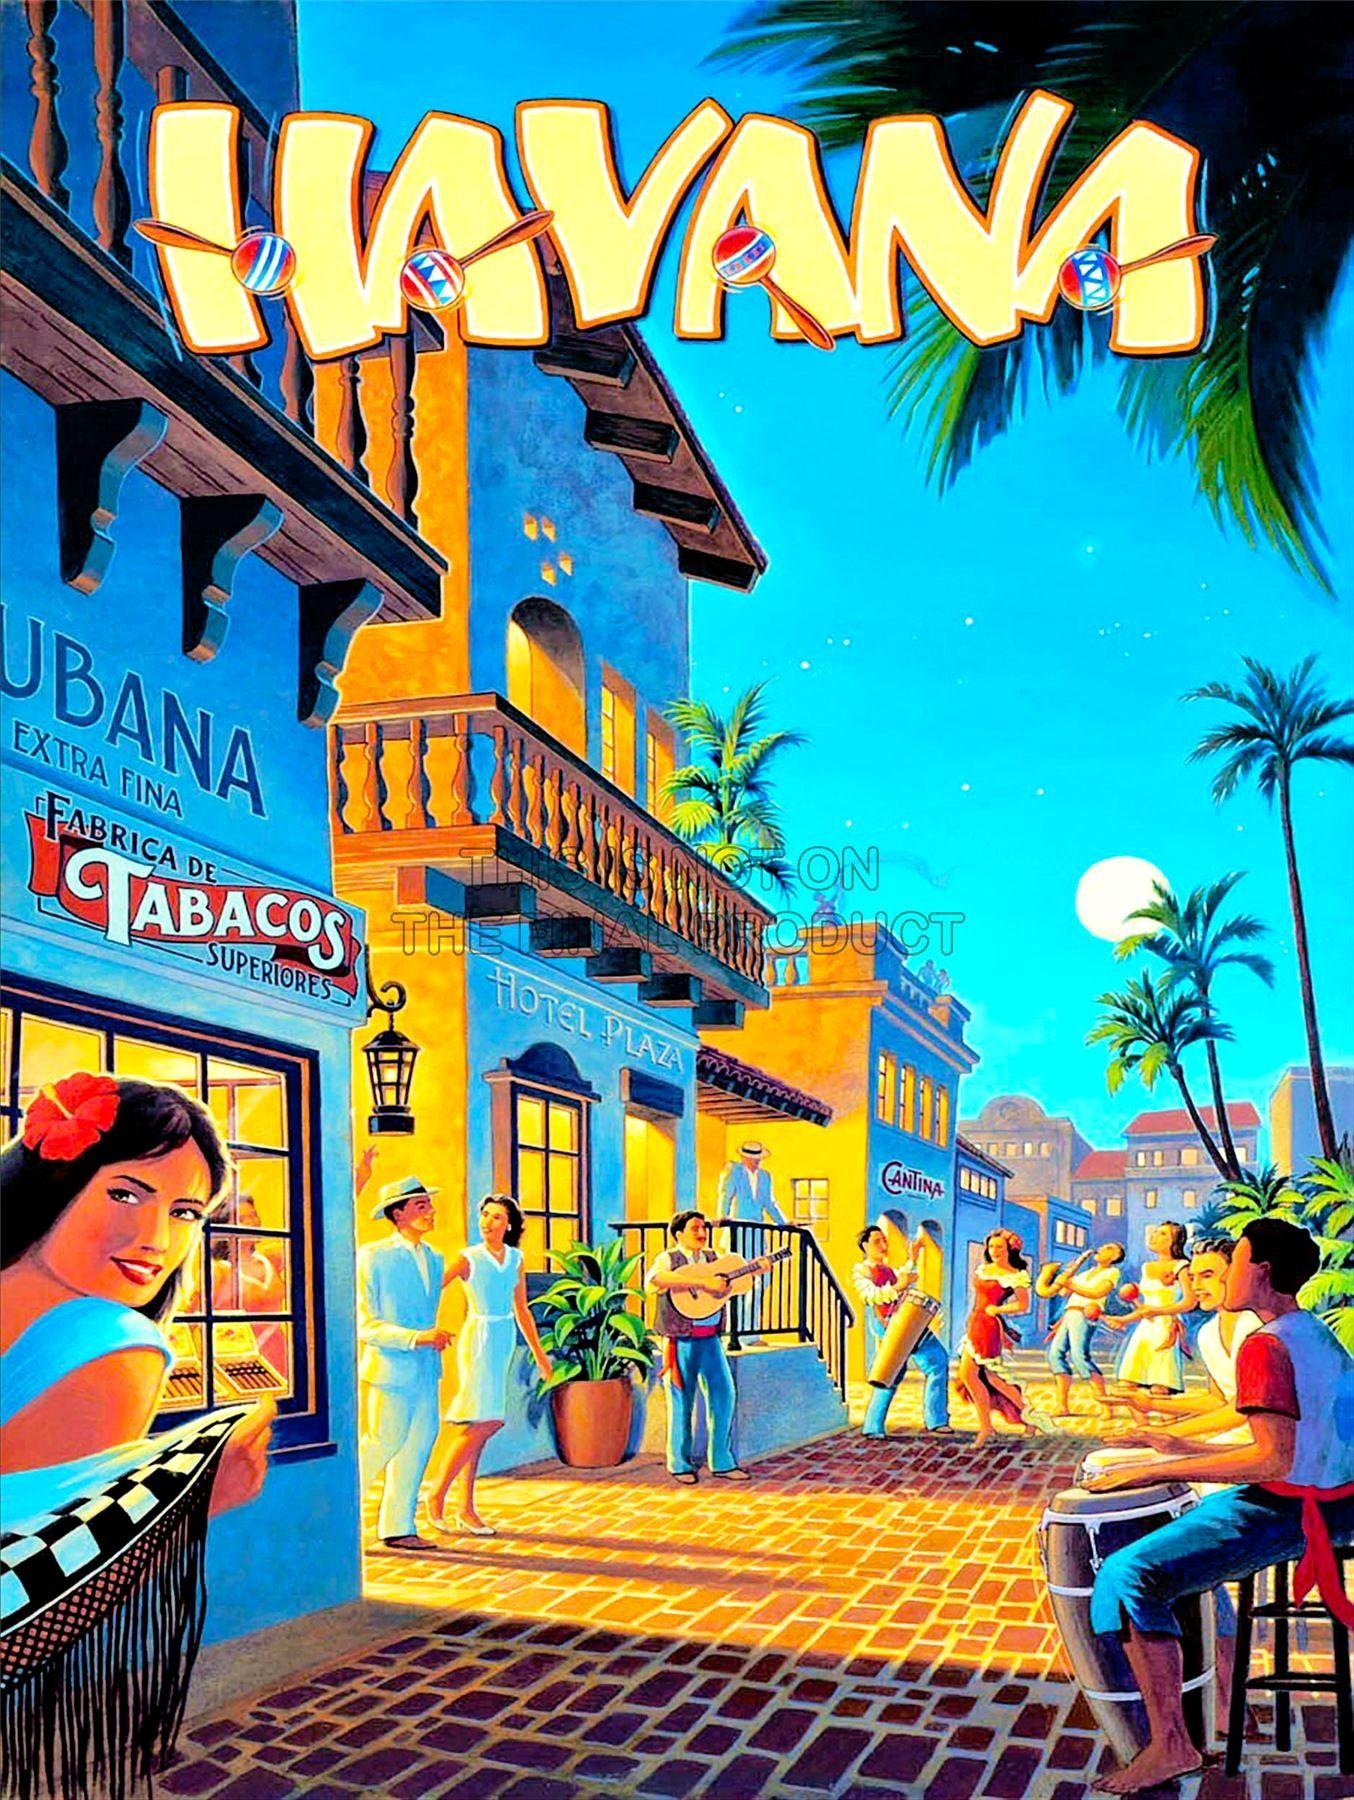 Havana Cuba Vintage Travel Poster Home Living Wall Decor Sizes Inches 8x10 12x18 16 20 18x24 24x36 Retro Travel Poster Vintage Travel Posters Travel Posters